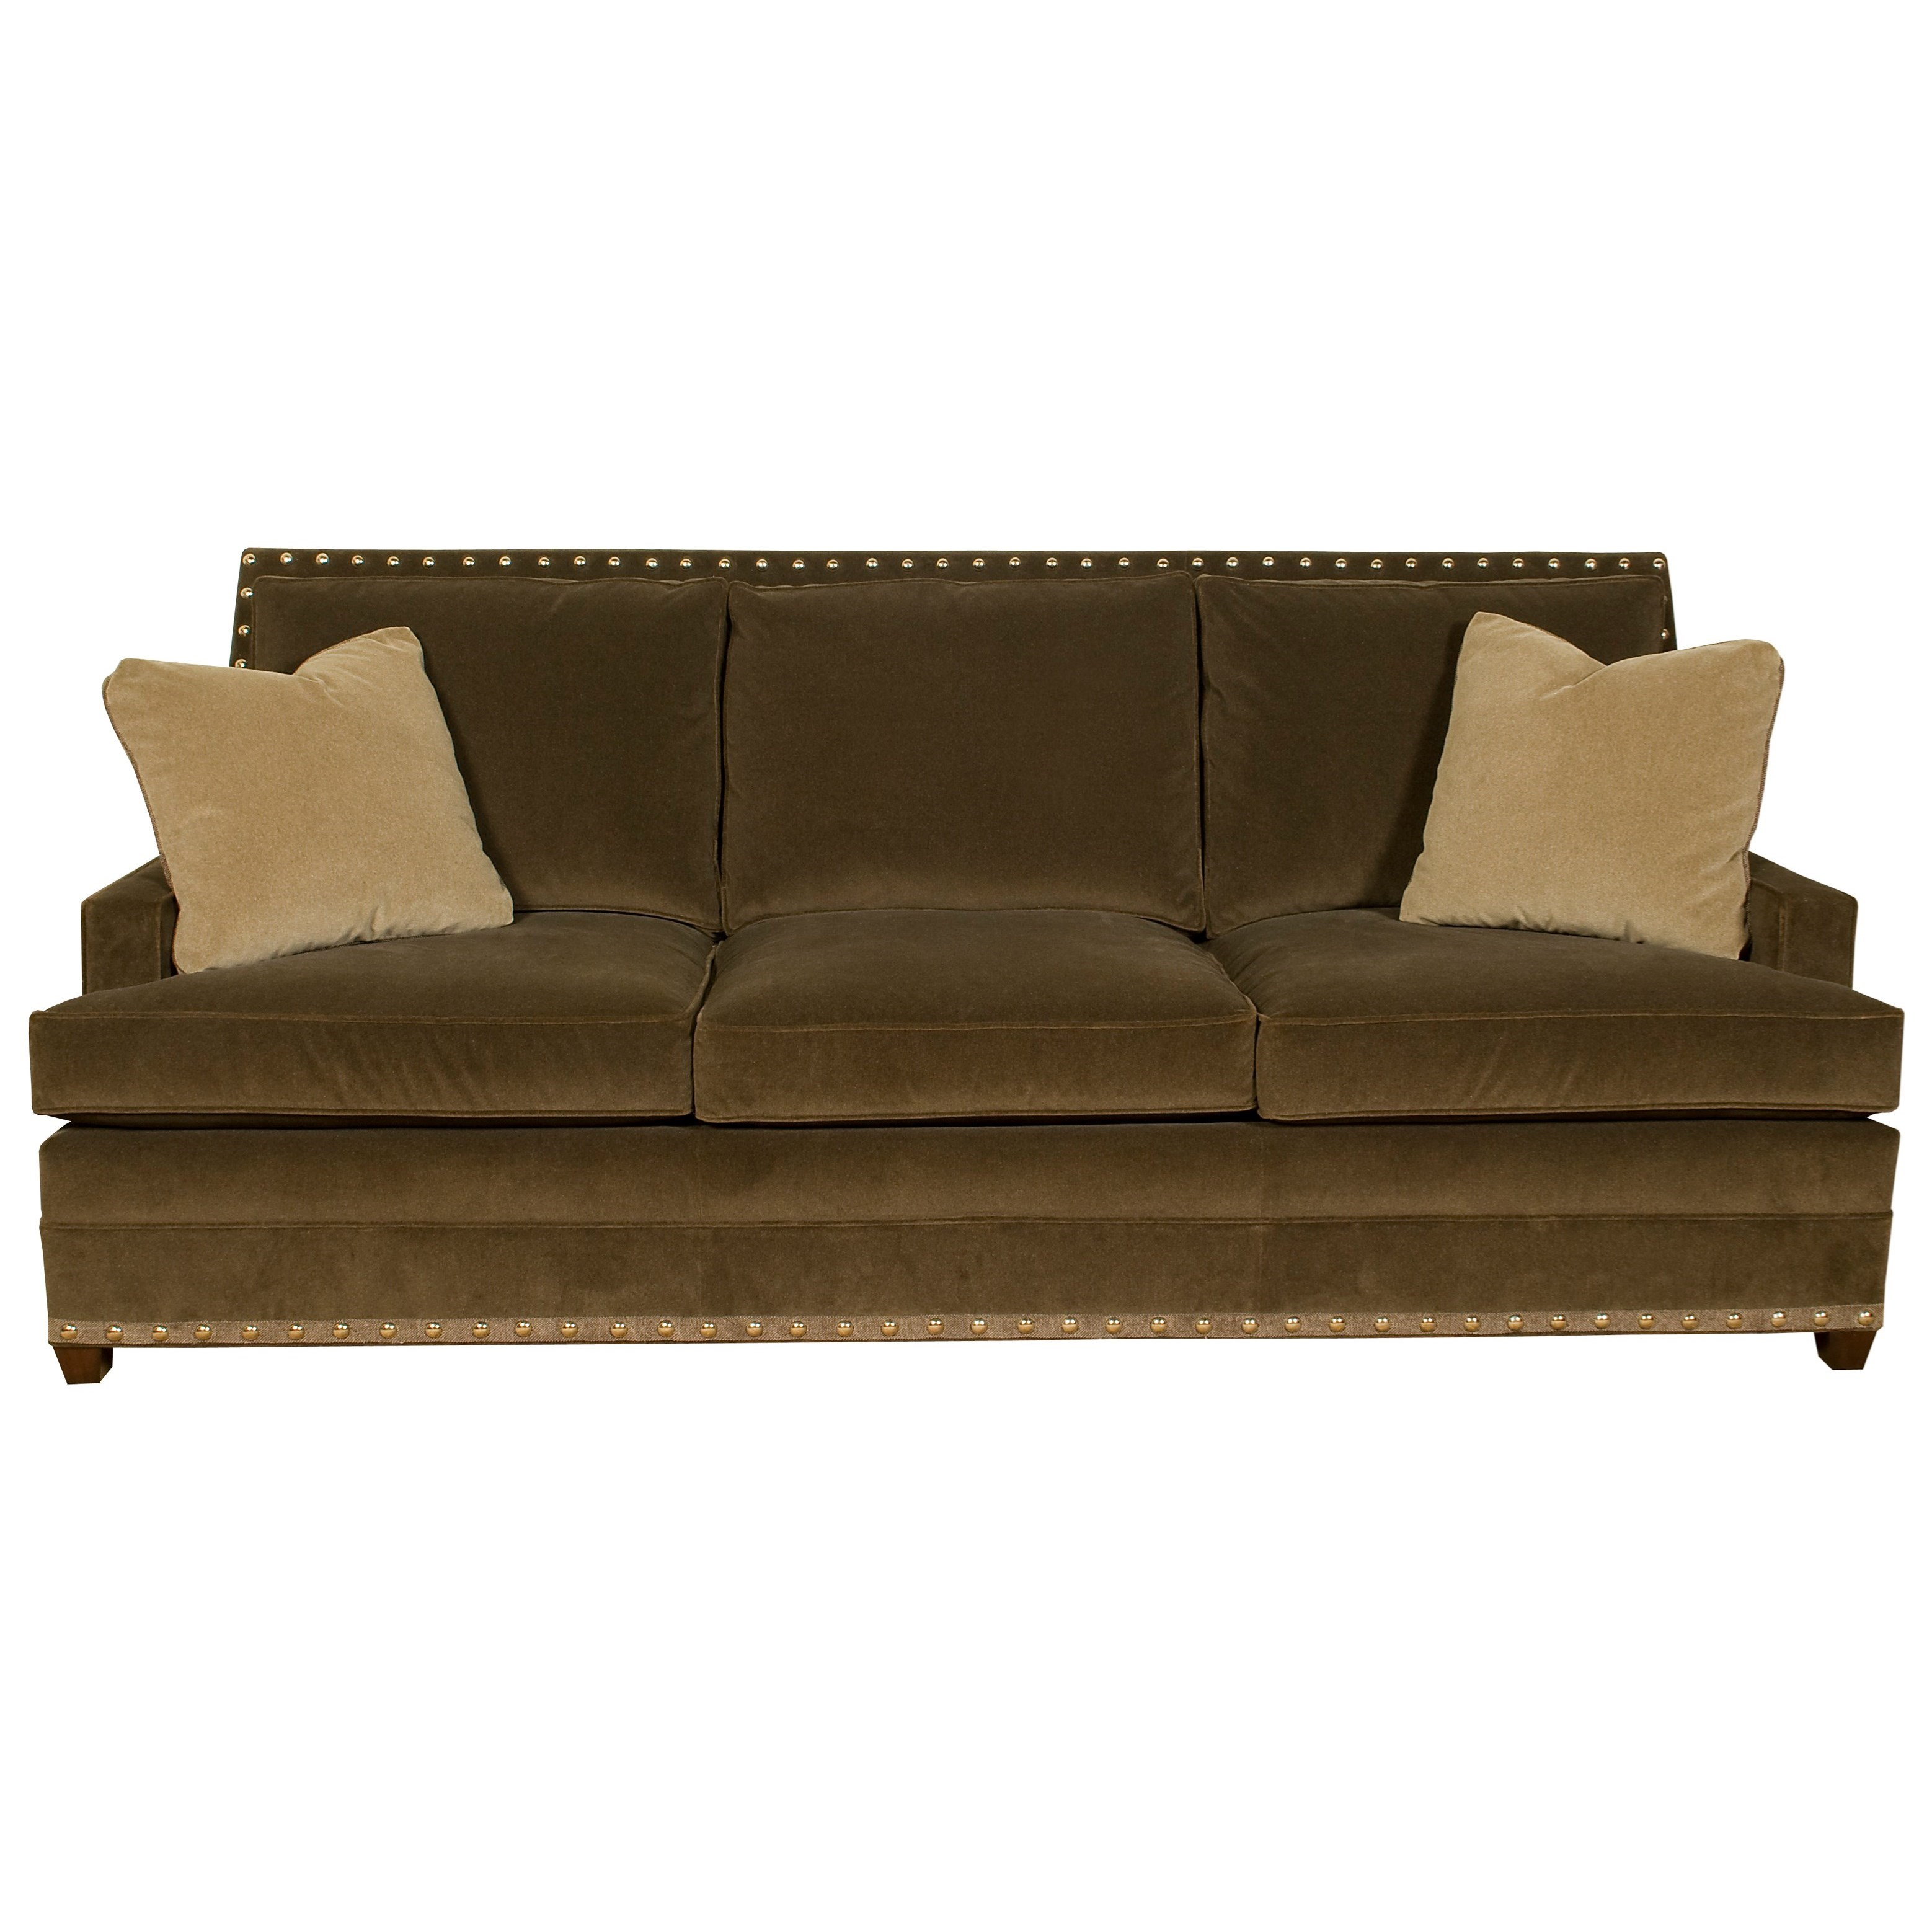 American Bungalow Riverside 3 Seat Sofa by Vanguard Furniture at Baer's Furniture